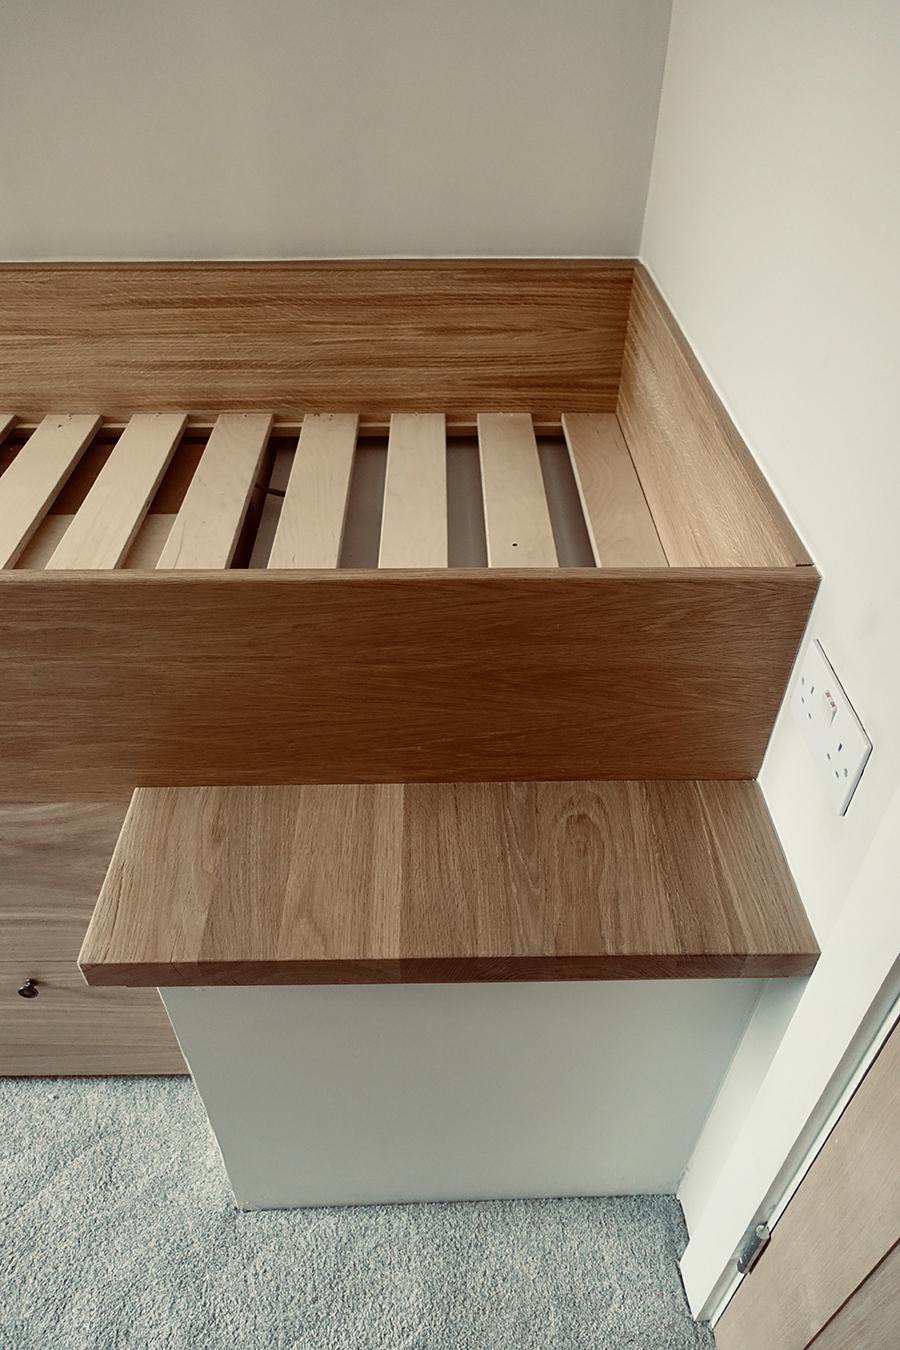 Bespoke Bed Framing